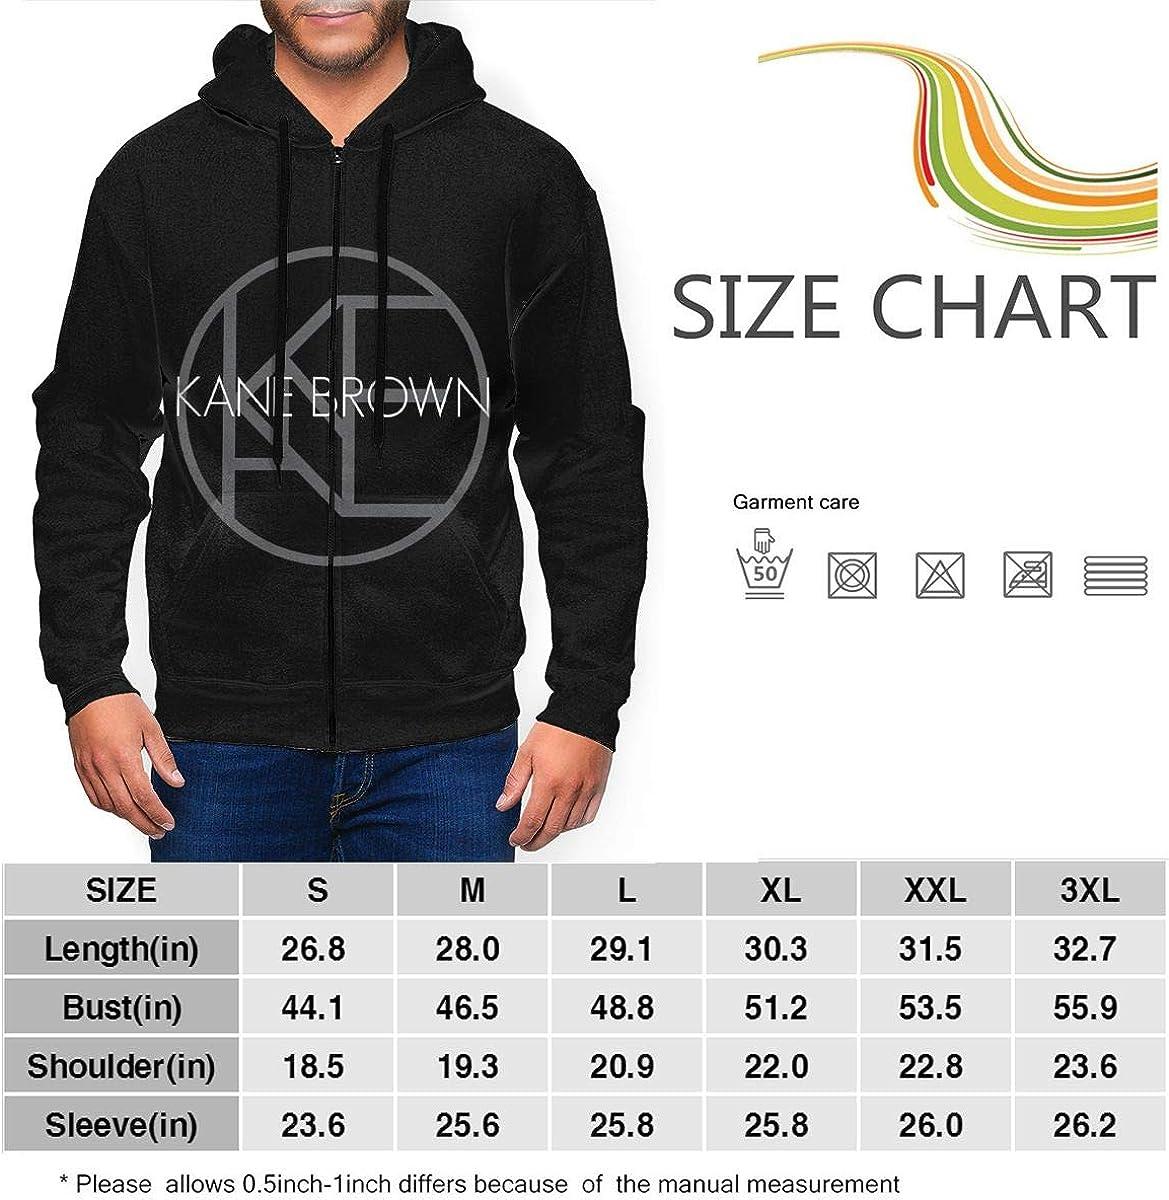 NICHOLAS COATES Kane Brown Better Place Mens Fashion Zipper Pullover Hoodie Sweatshirts